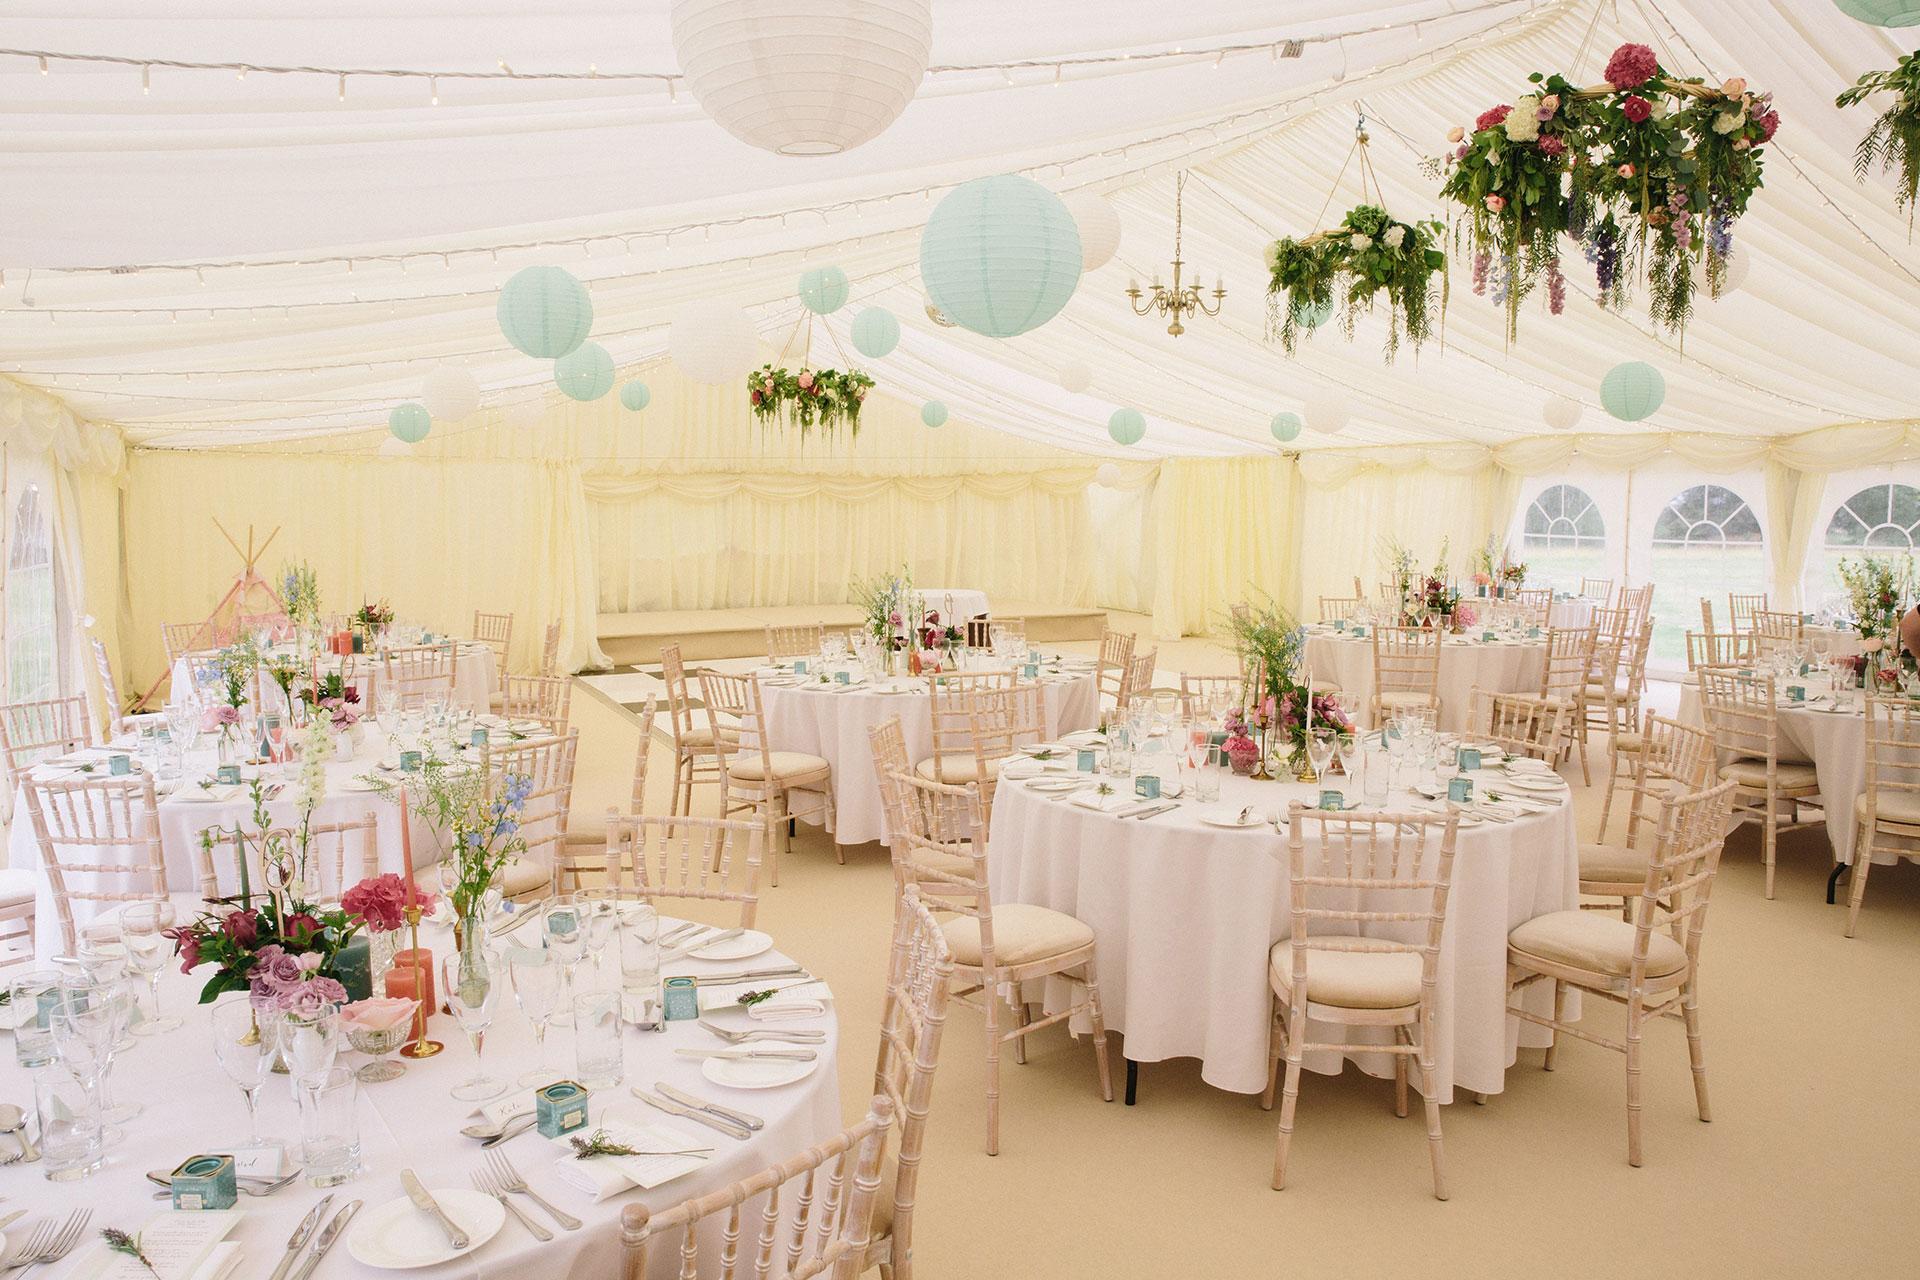 Langar-Hall-wedding-photographer-in-Nottinghamshire-Michael-Newington-Gray-54.jpg